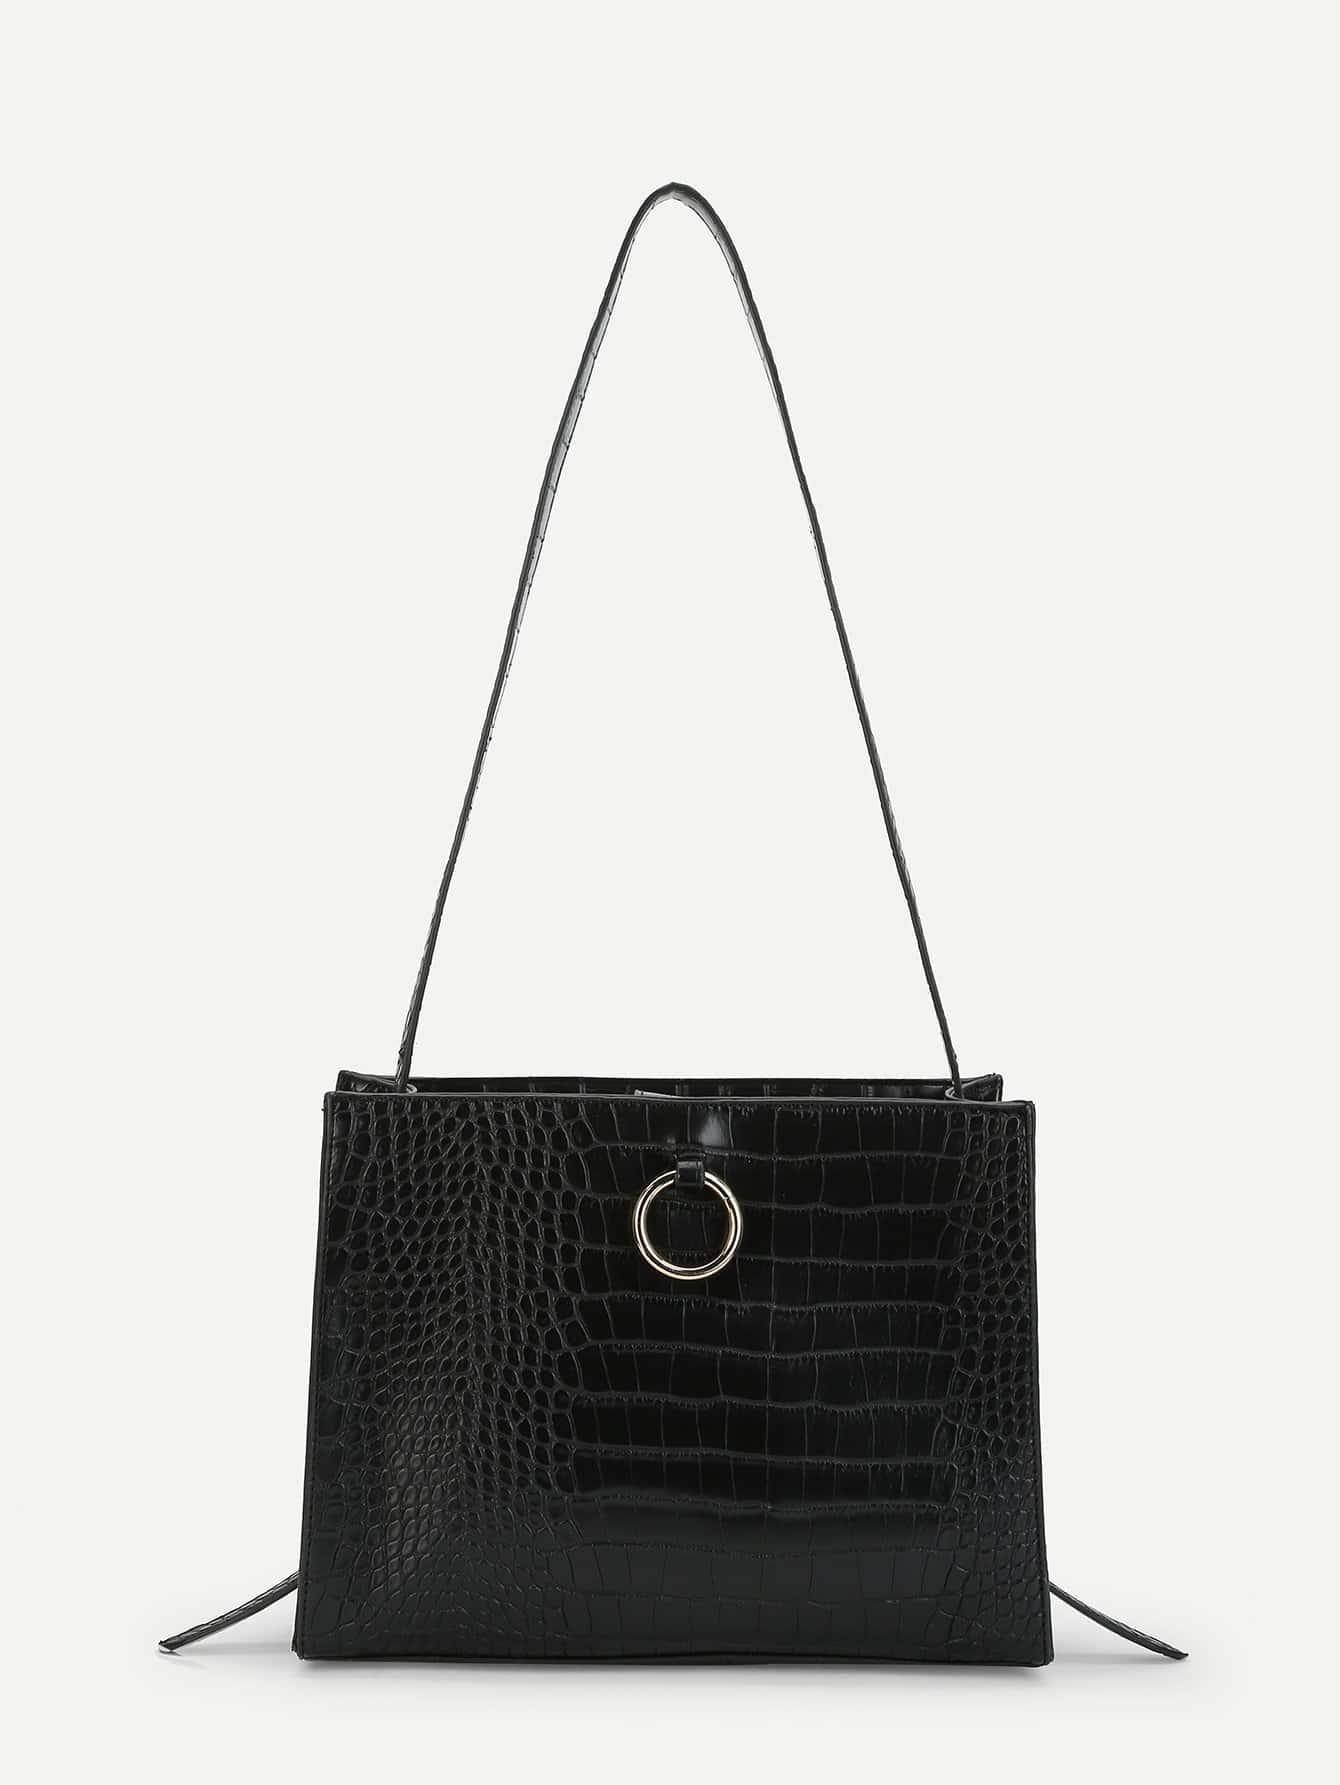 Ring Detail Crocodile Pattern PU Shoulder Bag luxurious crocodile pattern shoulder bag 100